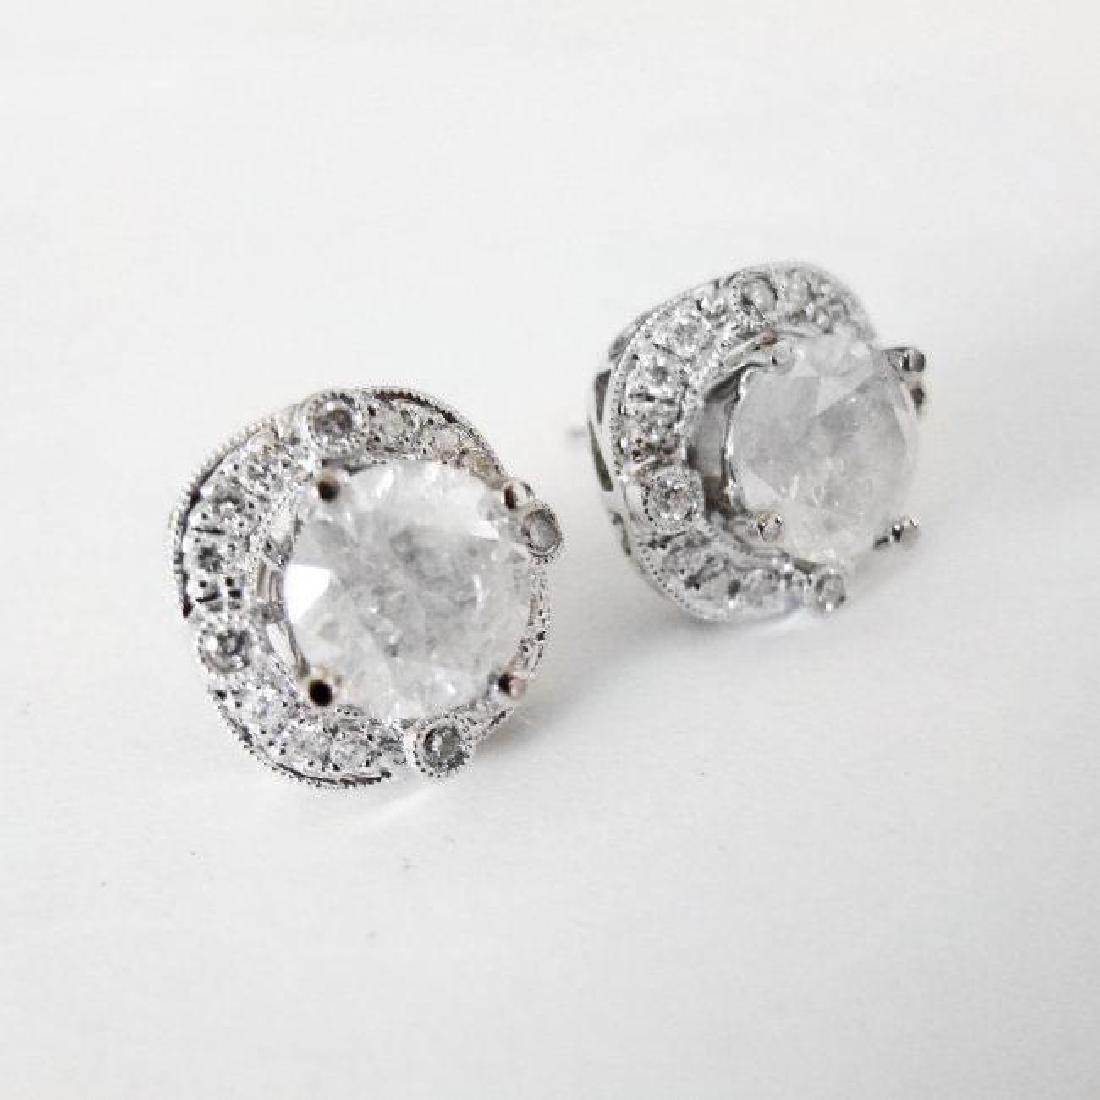 Jacket Stud Earrings Diamond 3.03Ct 18K White Gold - 3